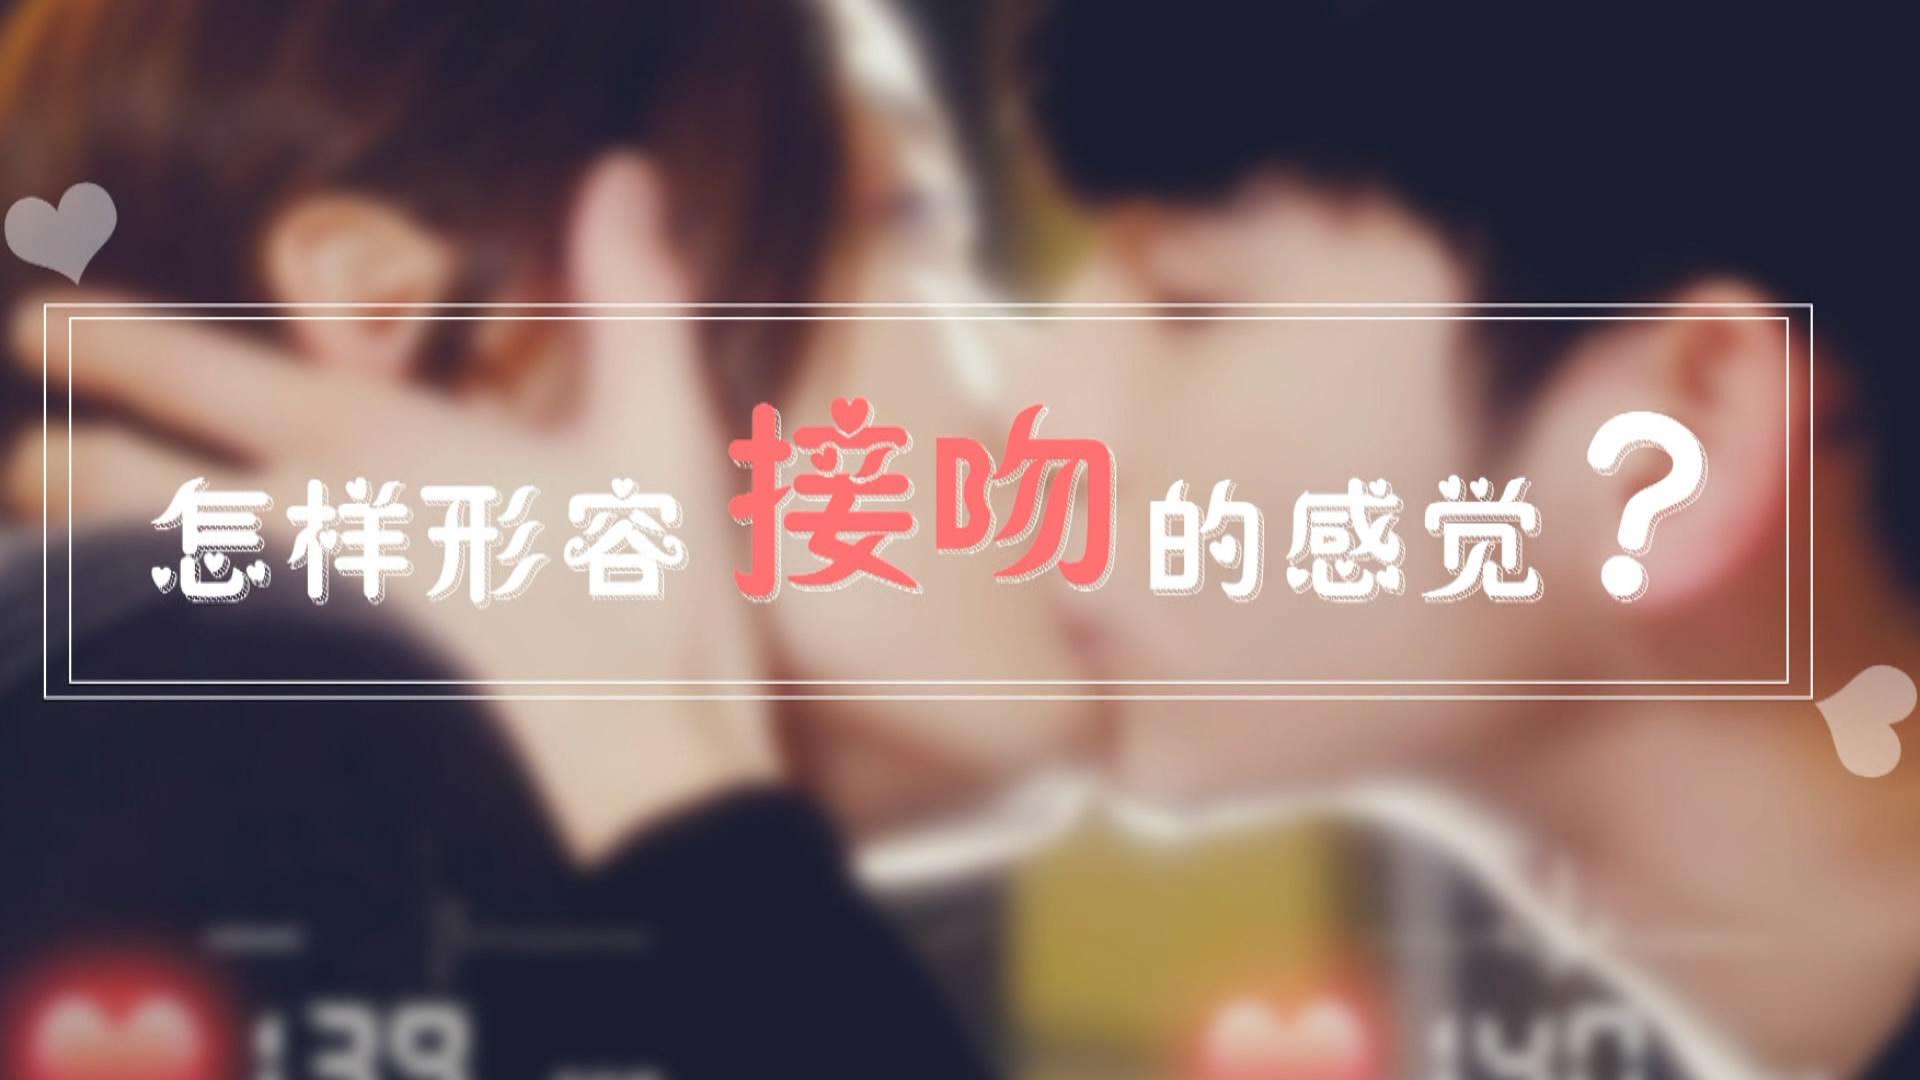 ca88亚洲城手机版【官方ca88亚洲城手机版下载】_接吻为什么让人欲罢不能